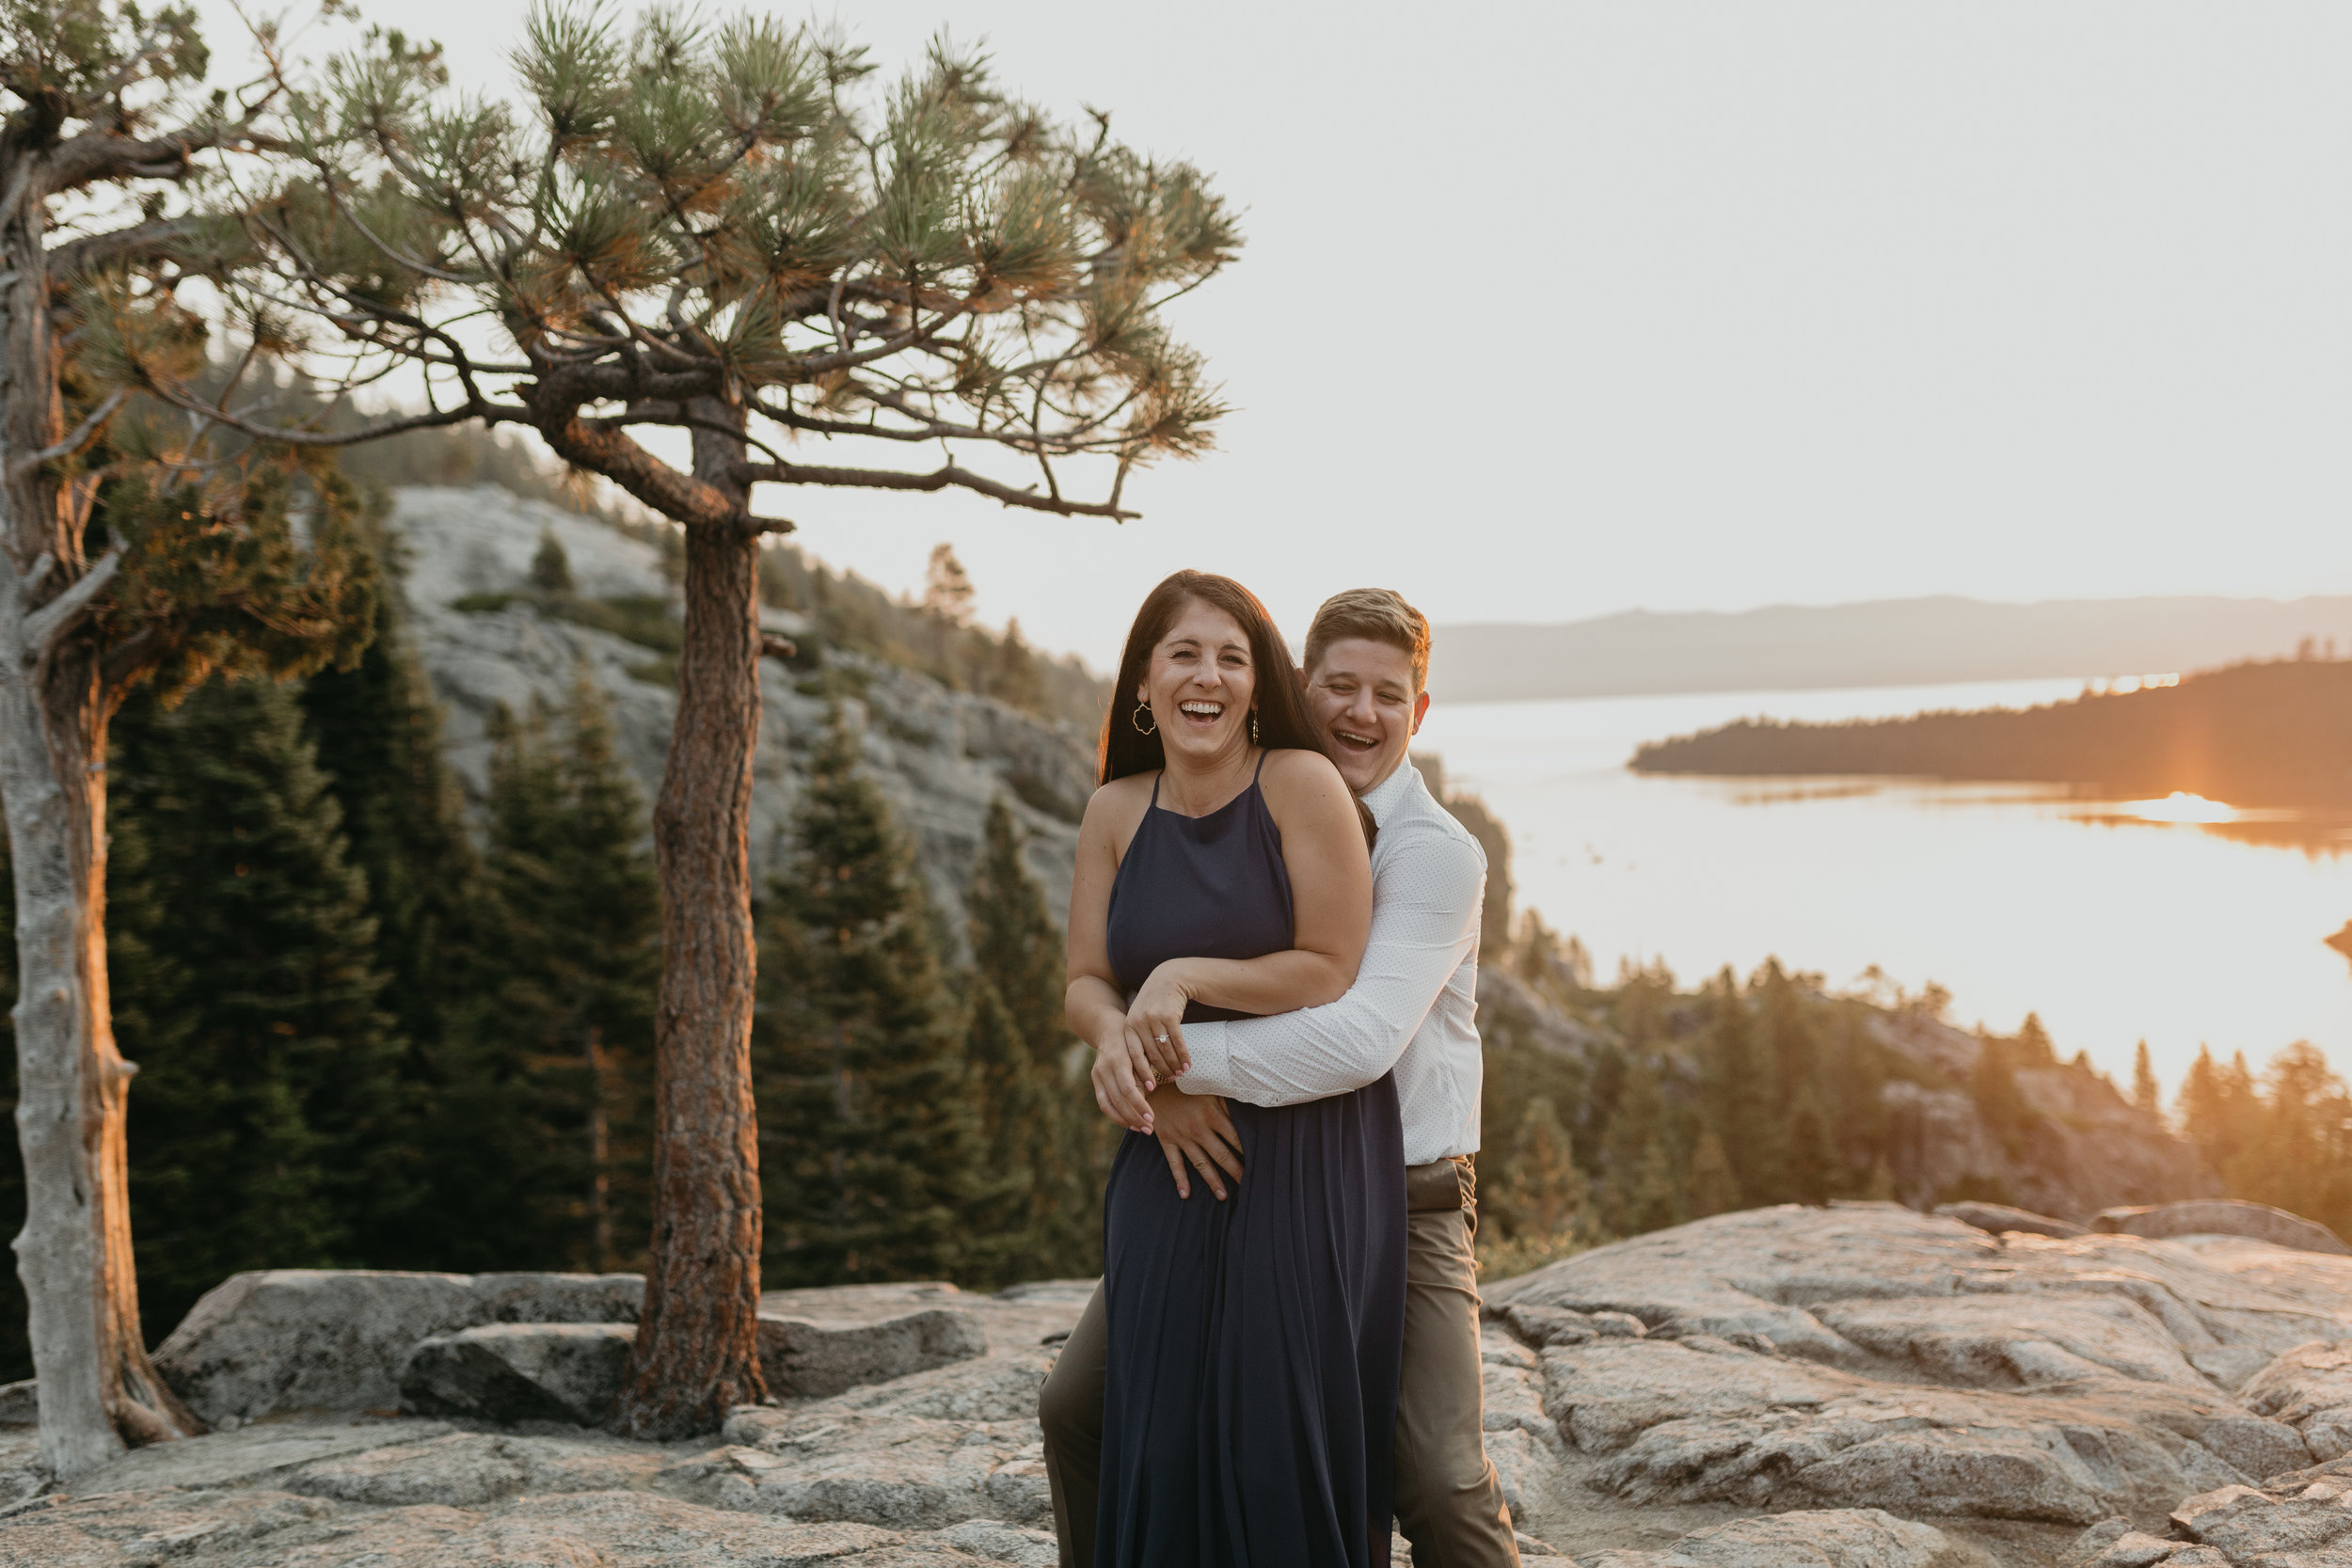 nicole-daacke-photography-lake-tahoe-sunrise-summer-adventure-engagement-photos-nevada-wedding-elopement-photographer-golden-emerald-bay-light-pine-trees-summer-vibe-fun-carefree-authentic-love-20.jpg